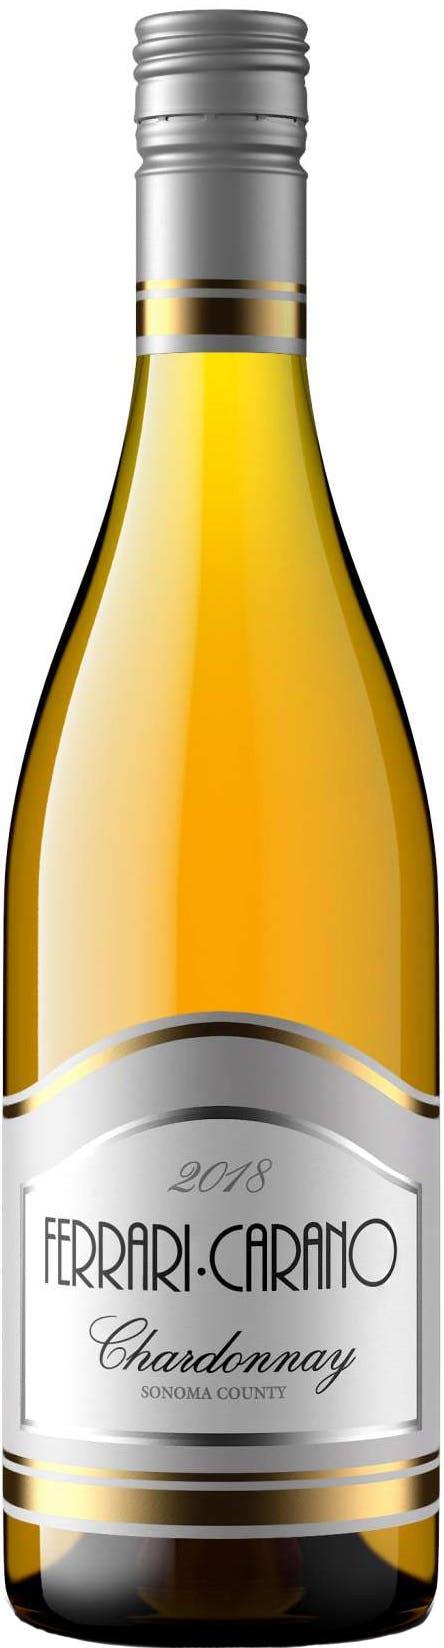 Ferrari Carano Chardonnay 2018 Vine Republic